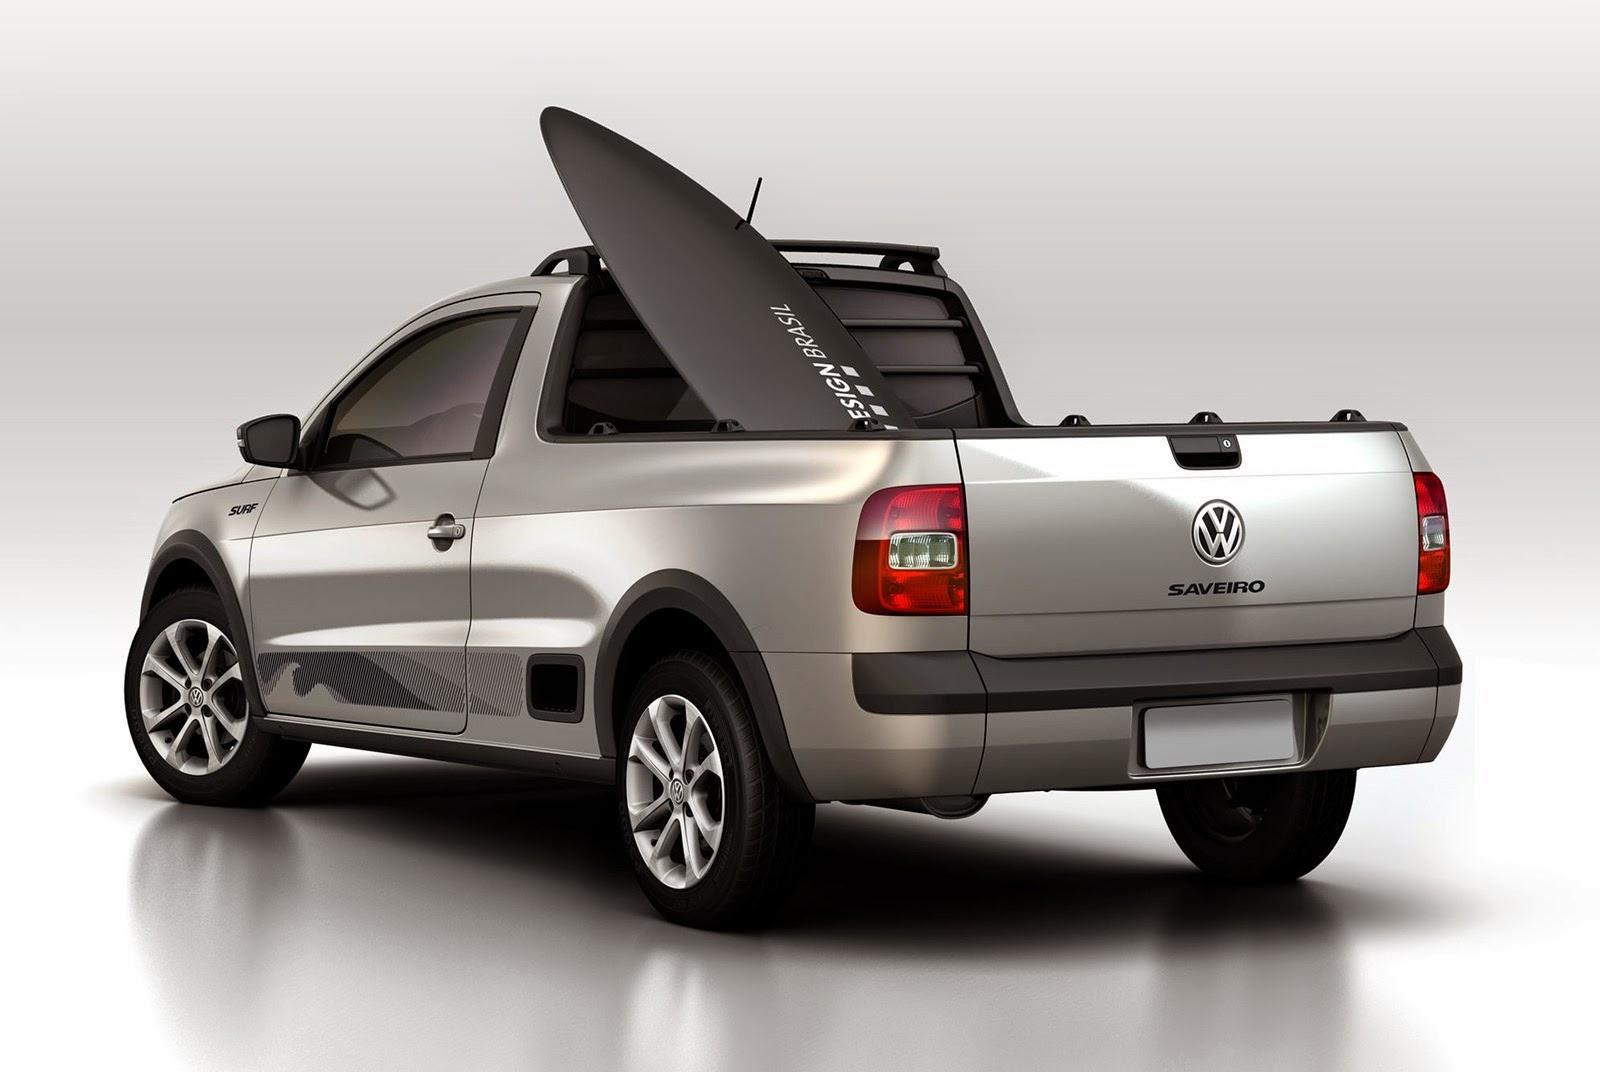 [Volkswagen%2520Saveiro%2520Surf%25202015%2520%25283%2529%255B3%255D.jpg]